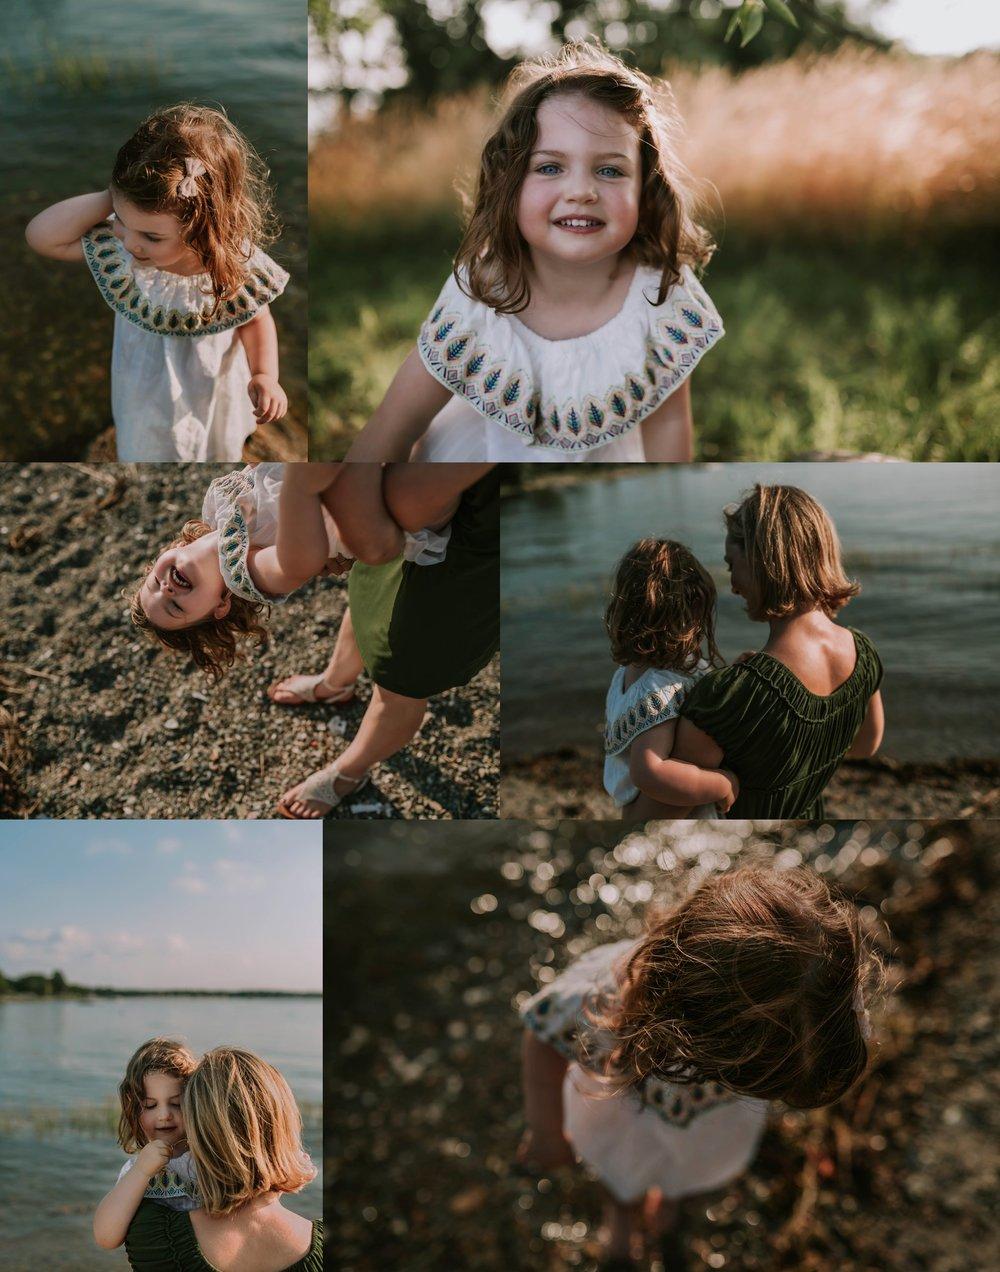 Summers_August_2018-135_Beautiful_Natural_Portraits_by_Award_Winning_Boston_Massachusetts_Family_Portrait_Photographer_Asher_and_Oak_Photography.jpg